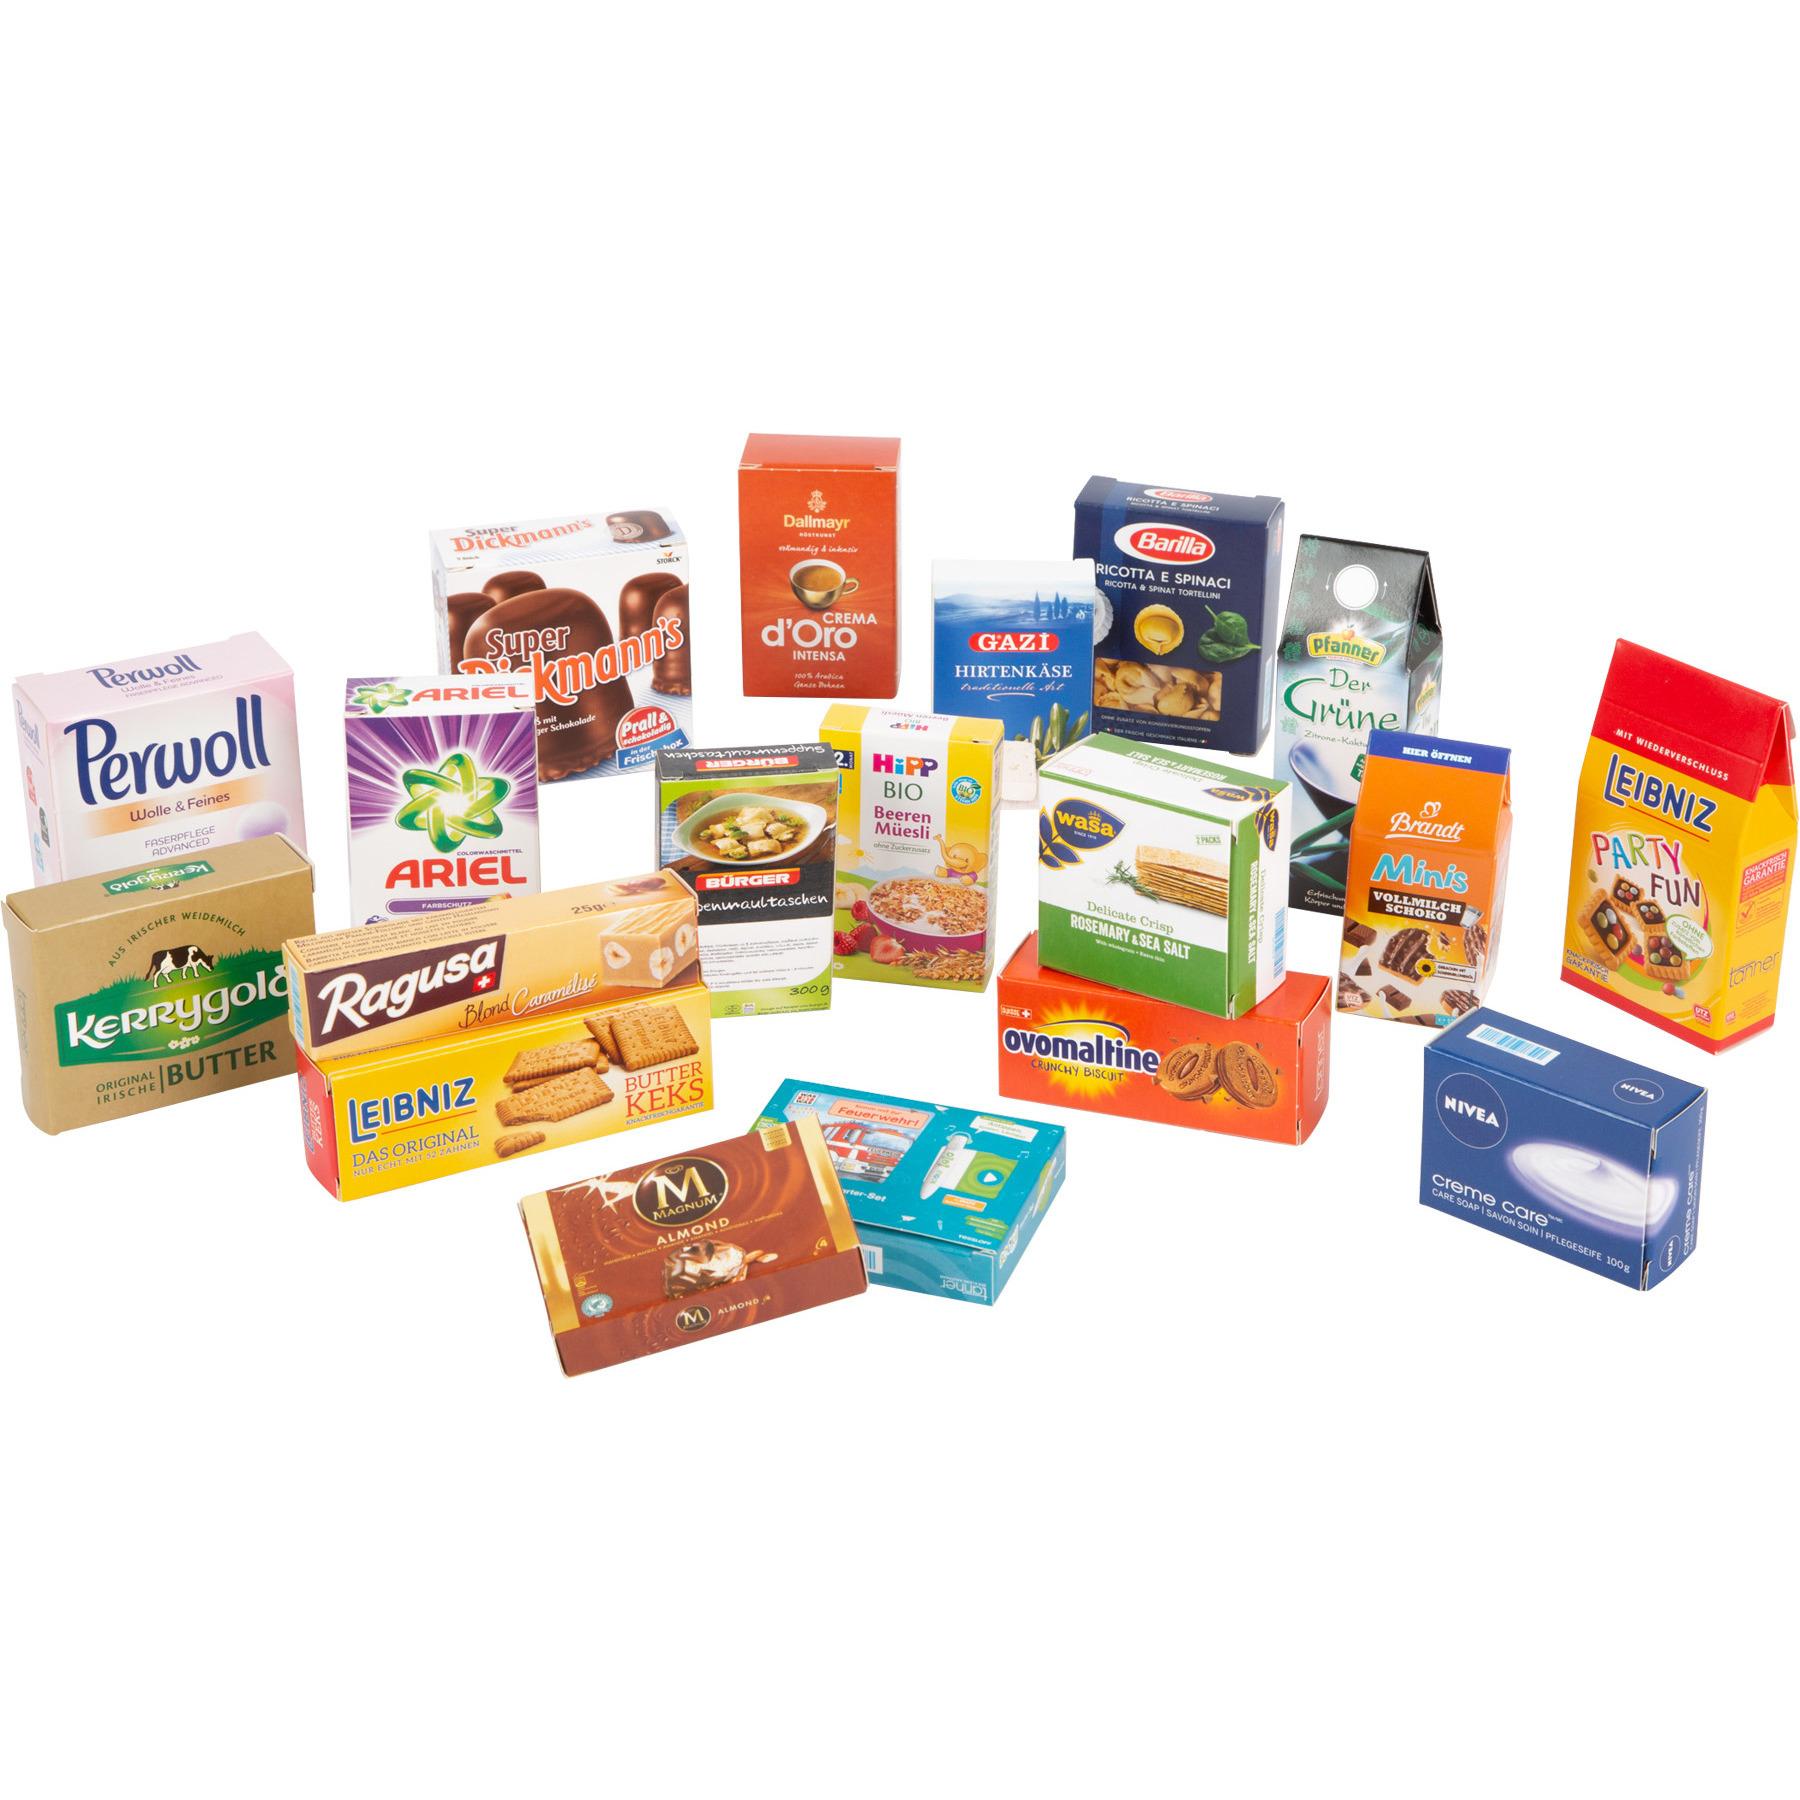 Speelgoed supermarkt accessoires 60 delig